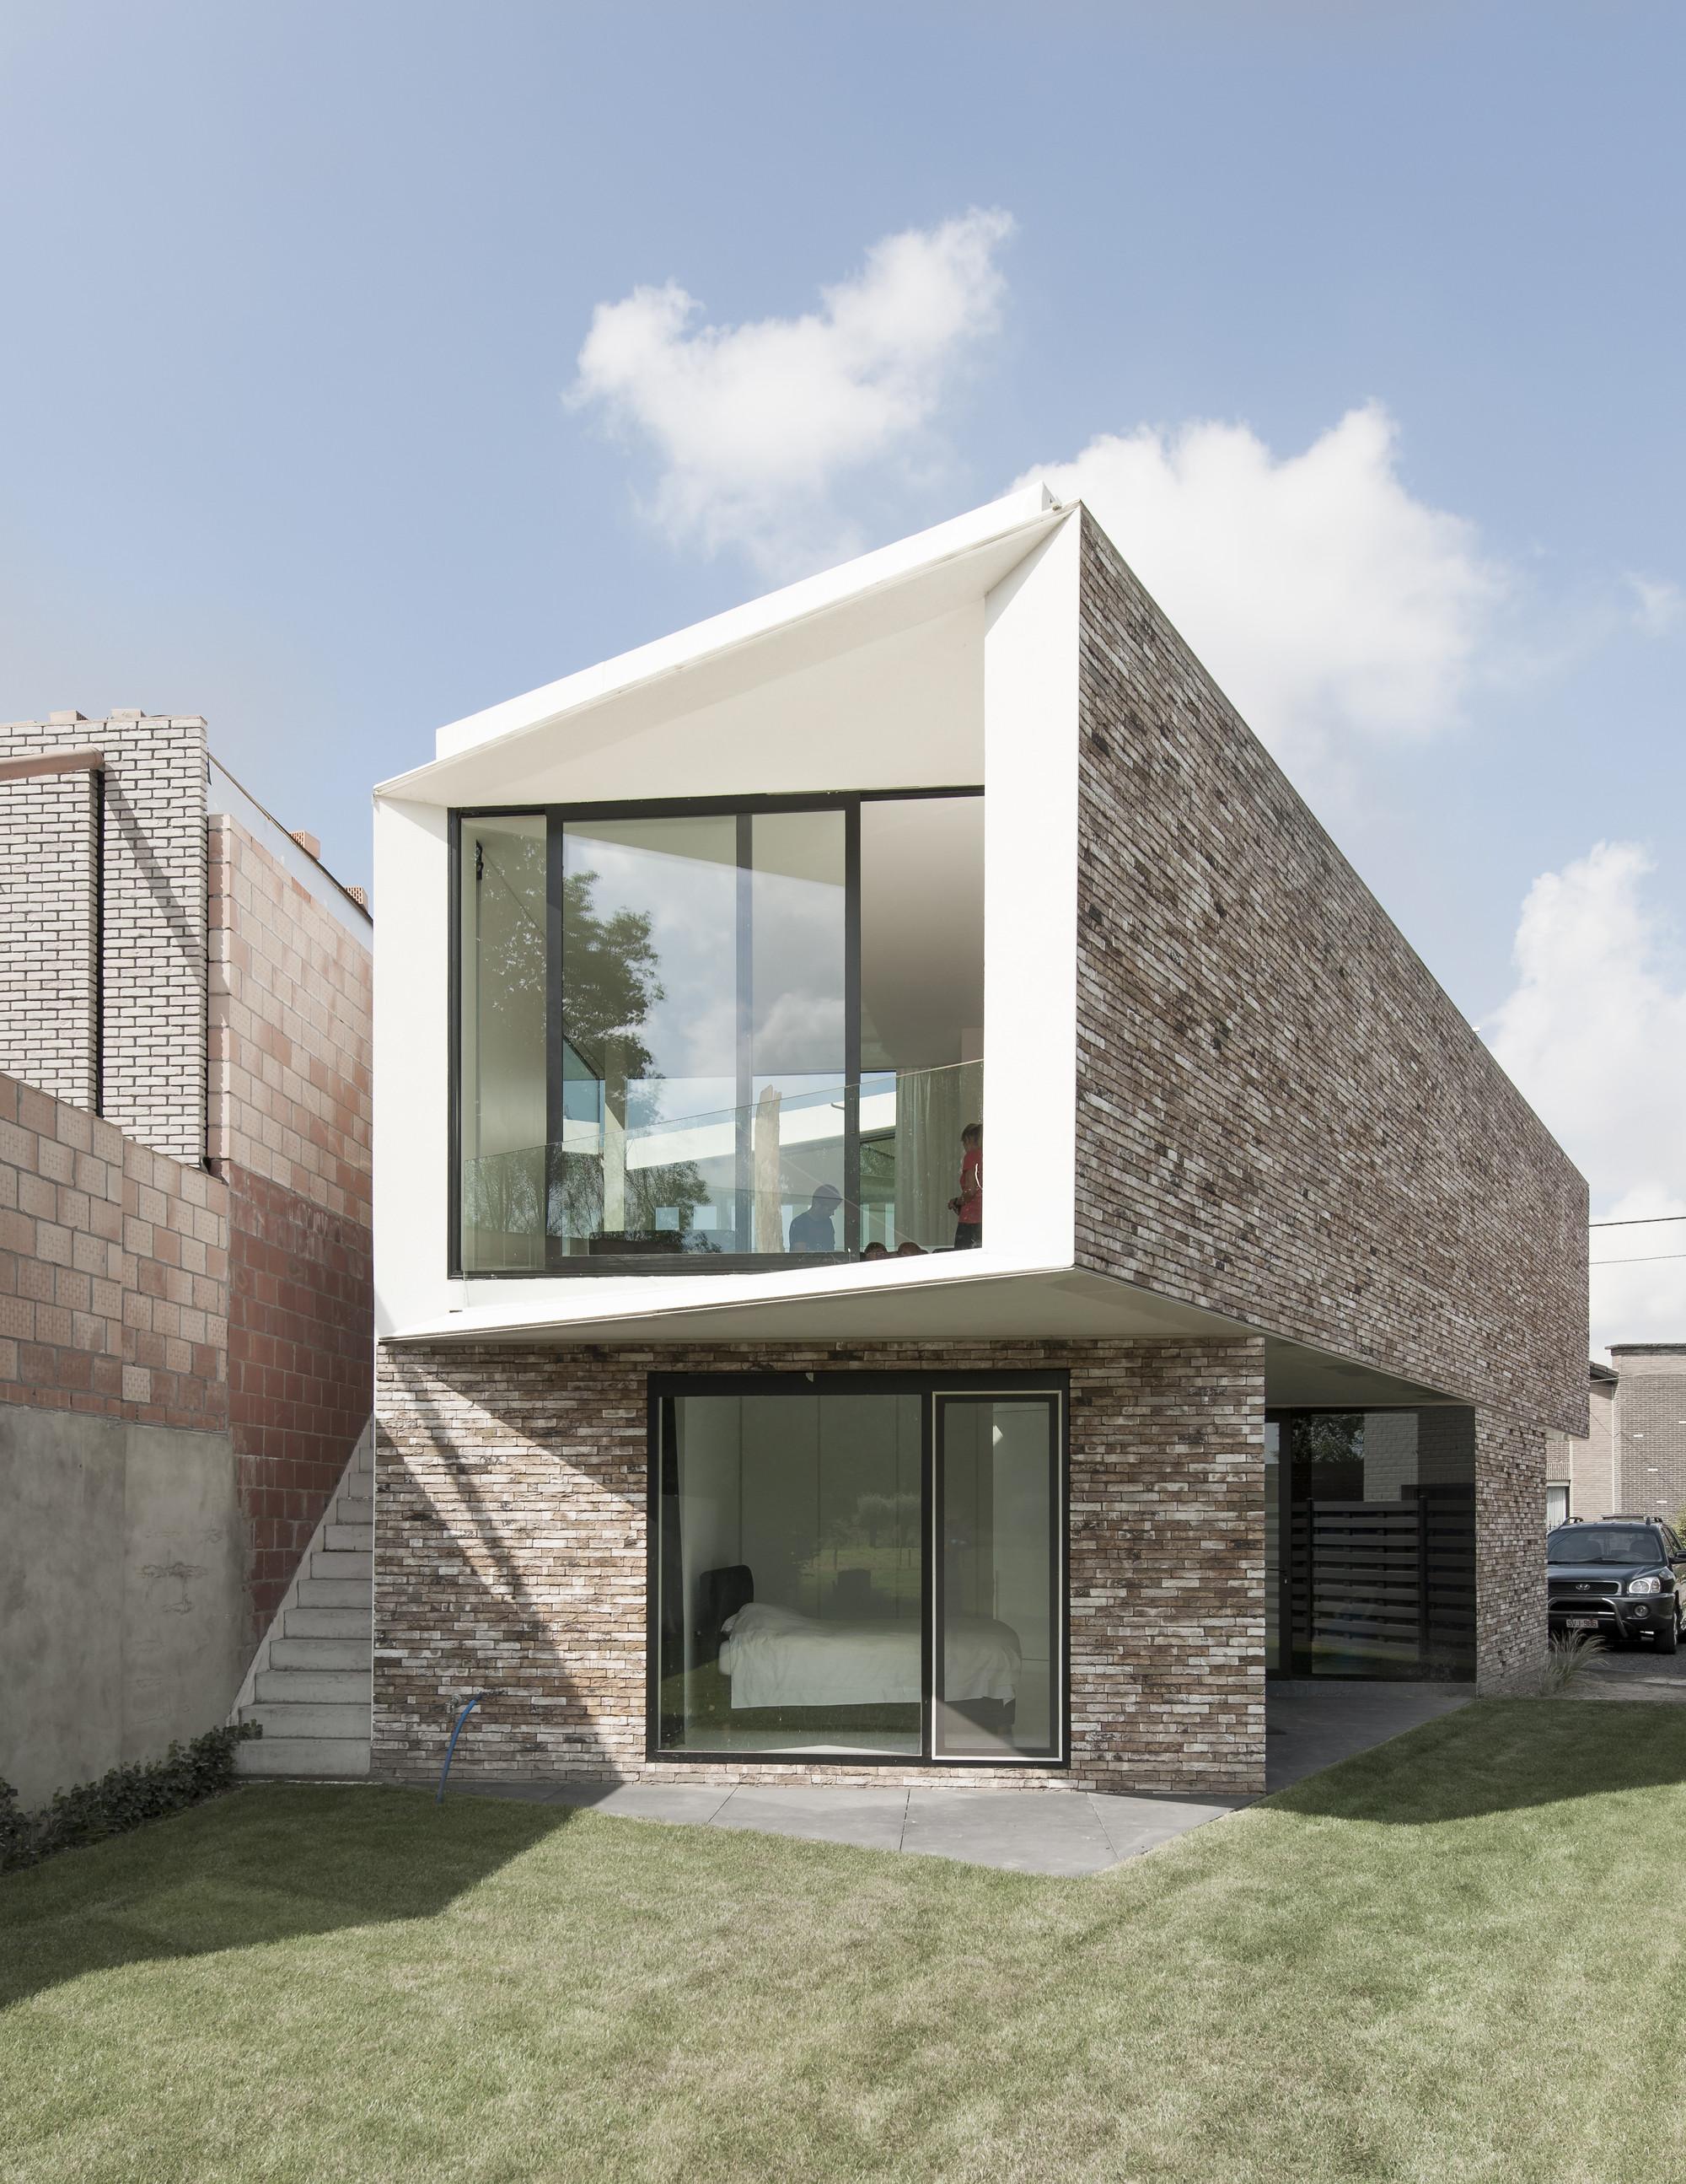 Gallery of house k graux baeyens architecten 5 - Nicolas petit architecte ...